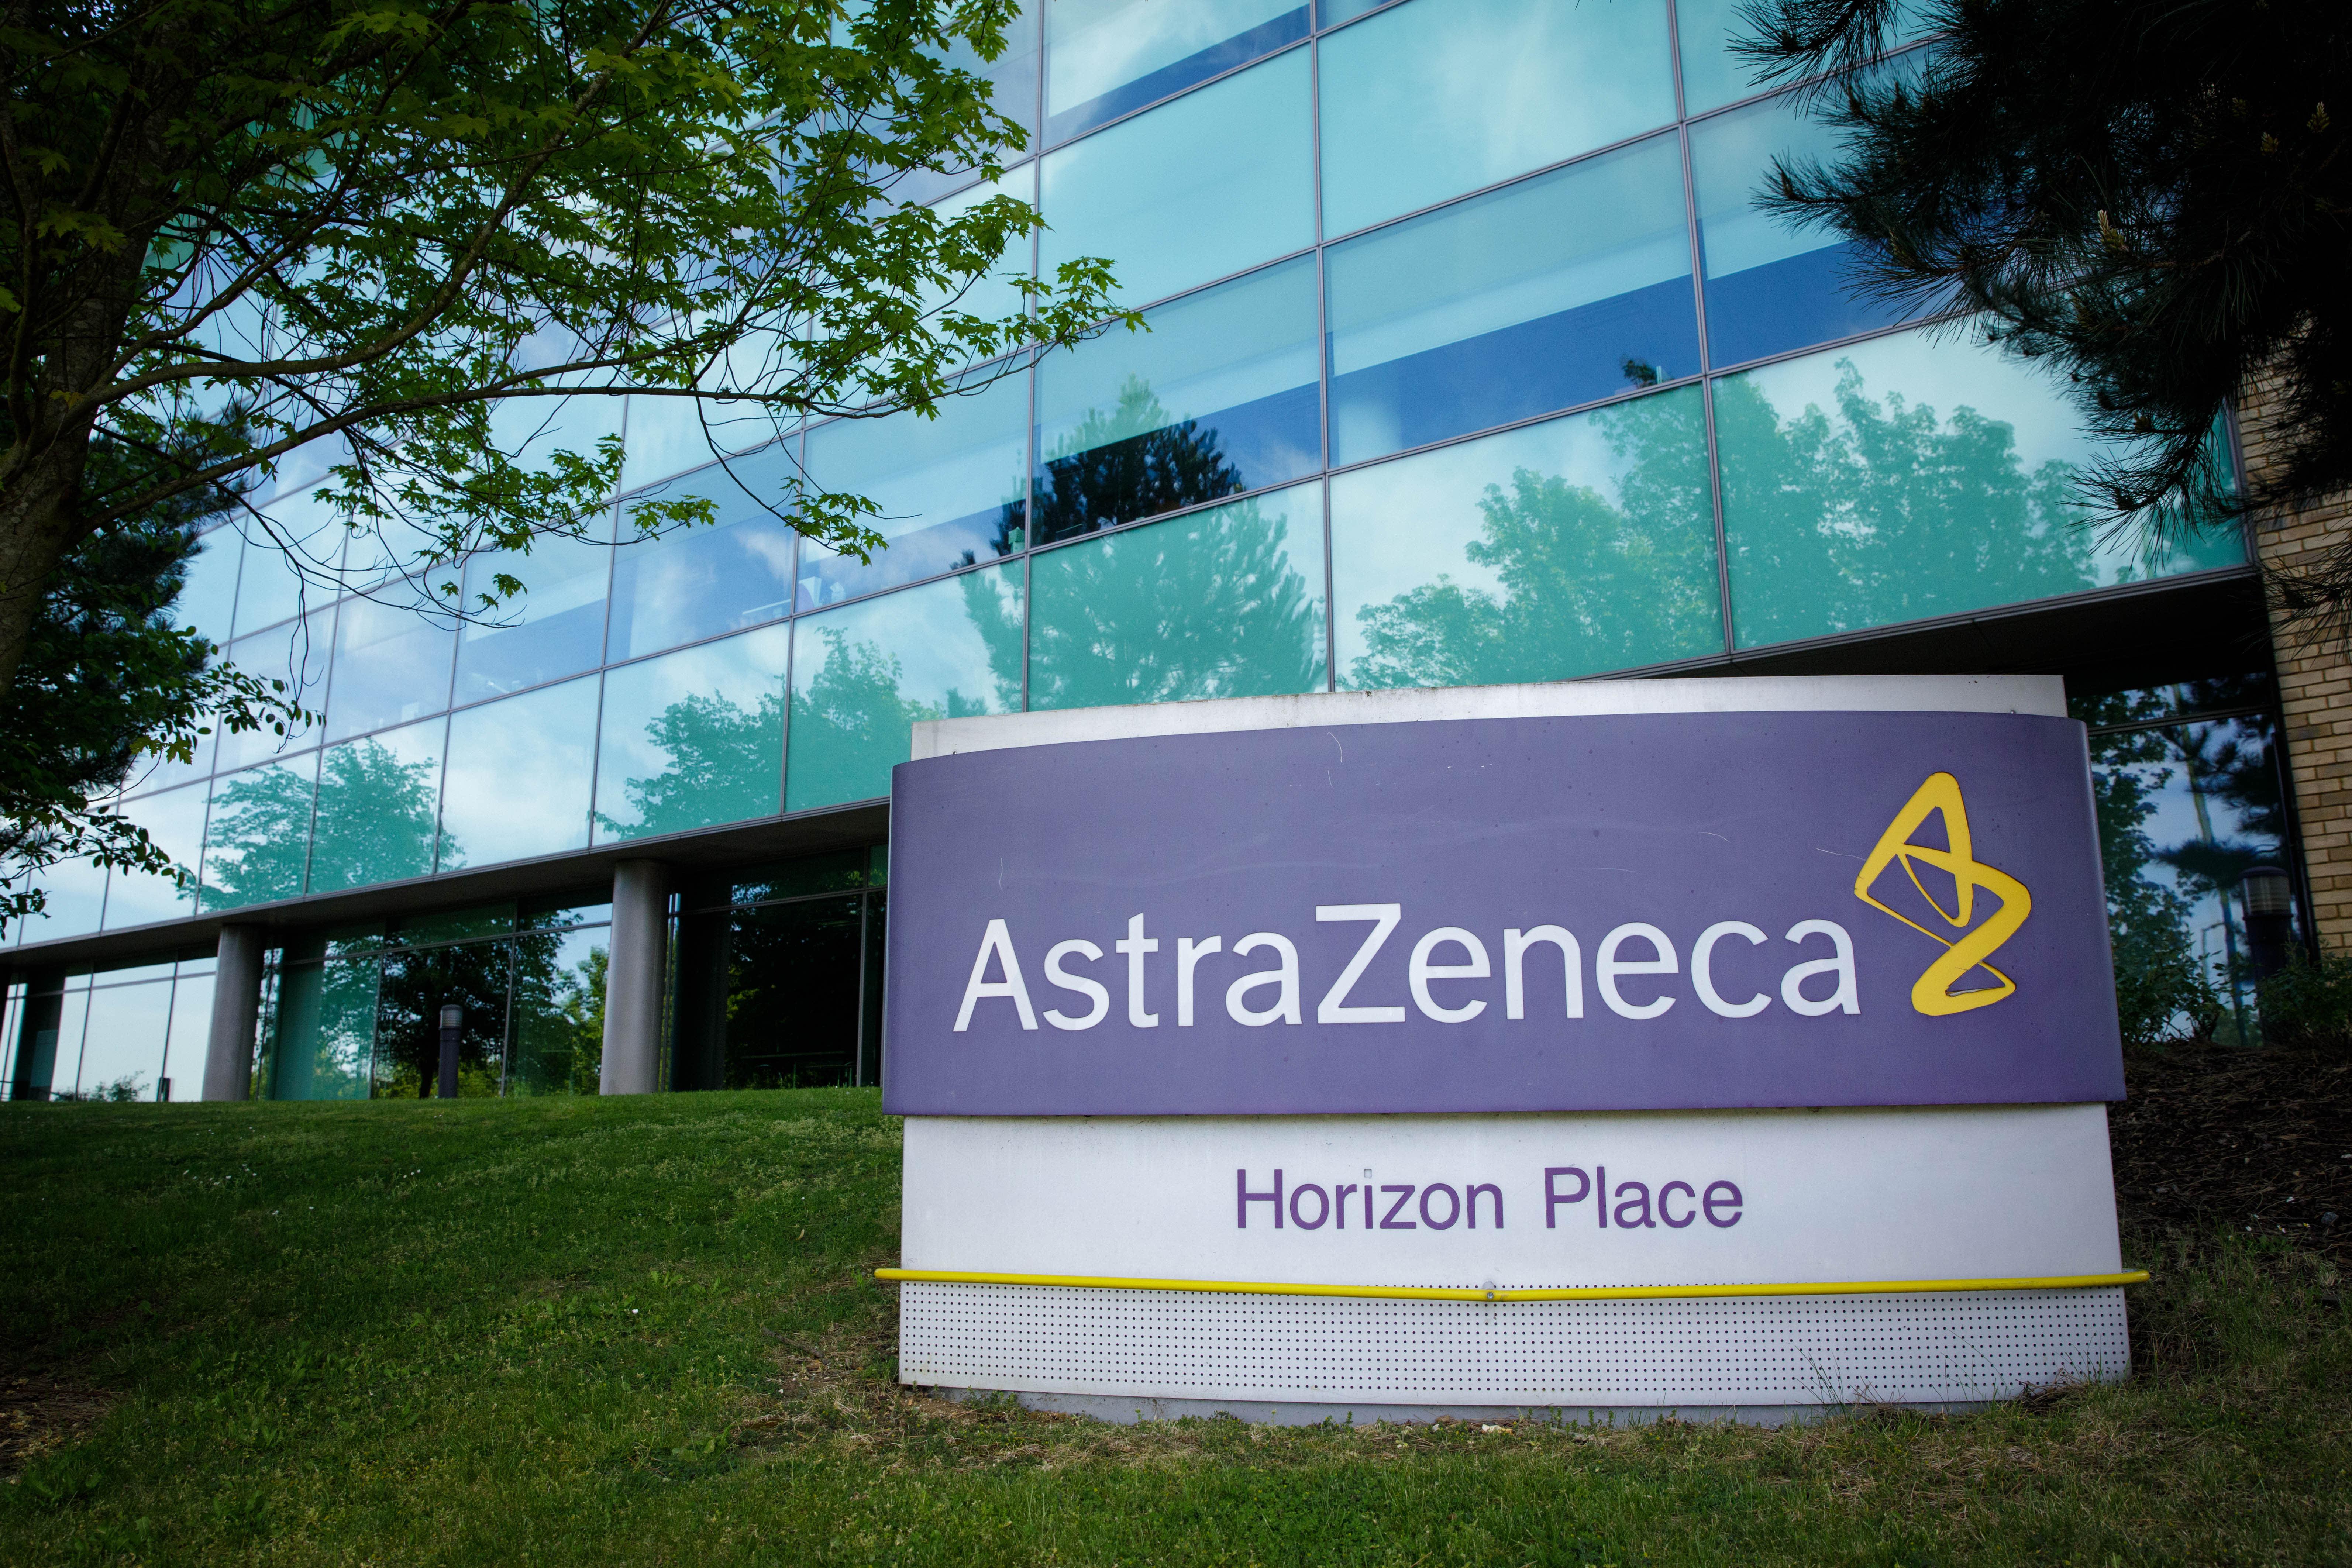 AstraZeneca is set to make two billion doses of a coronavirus vaccine